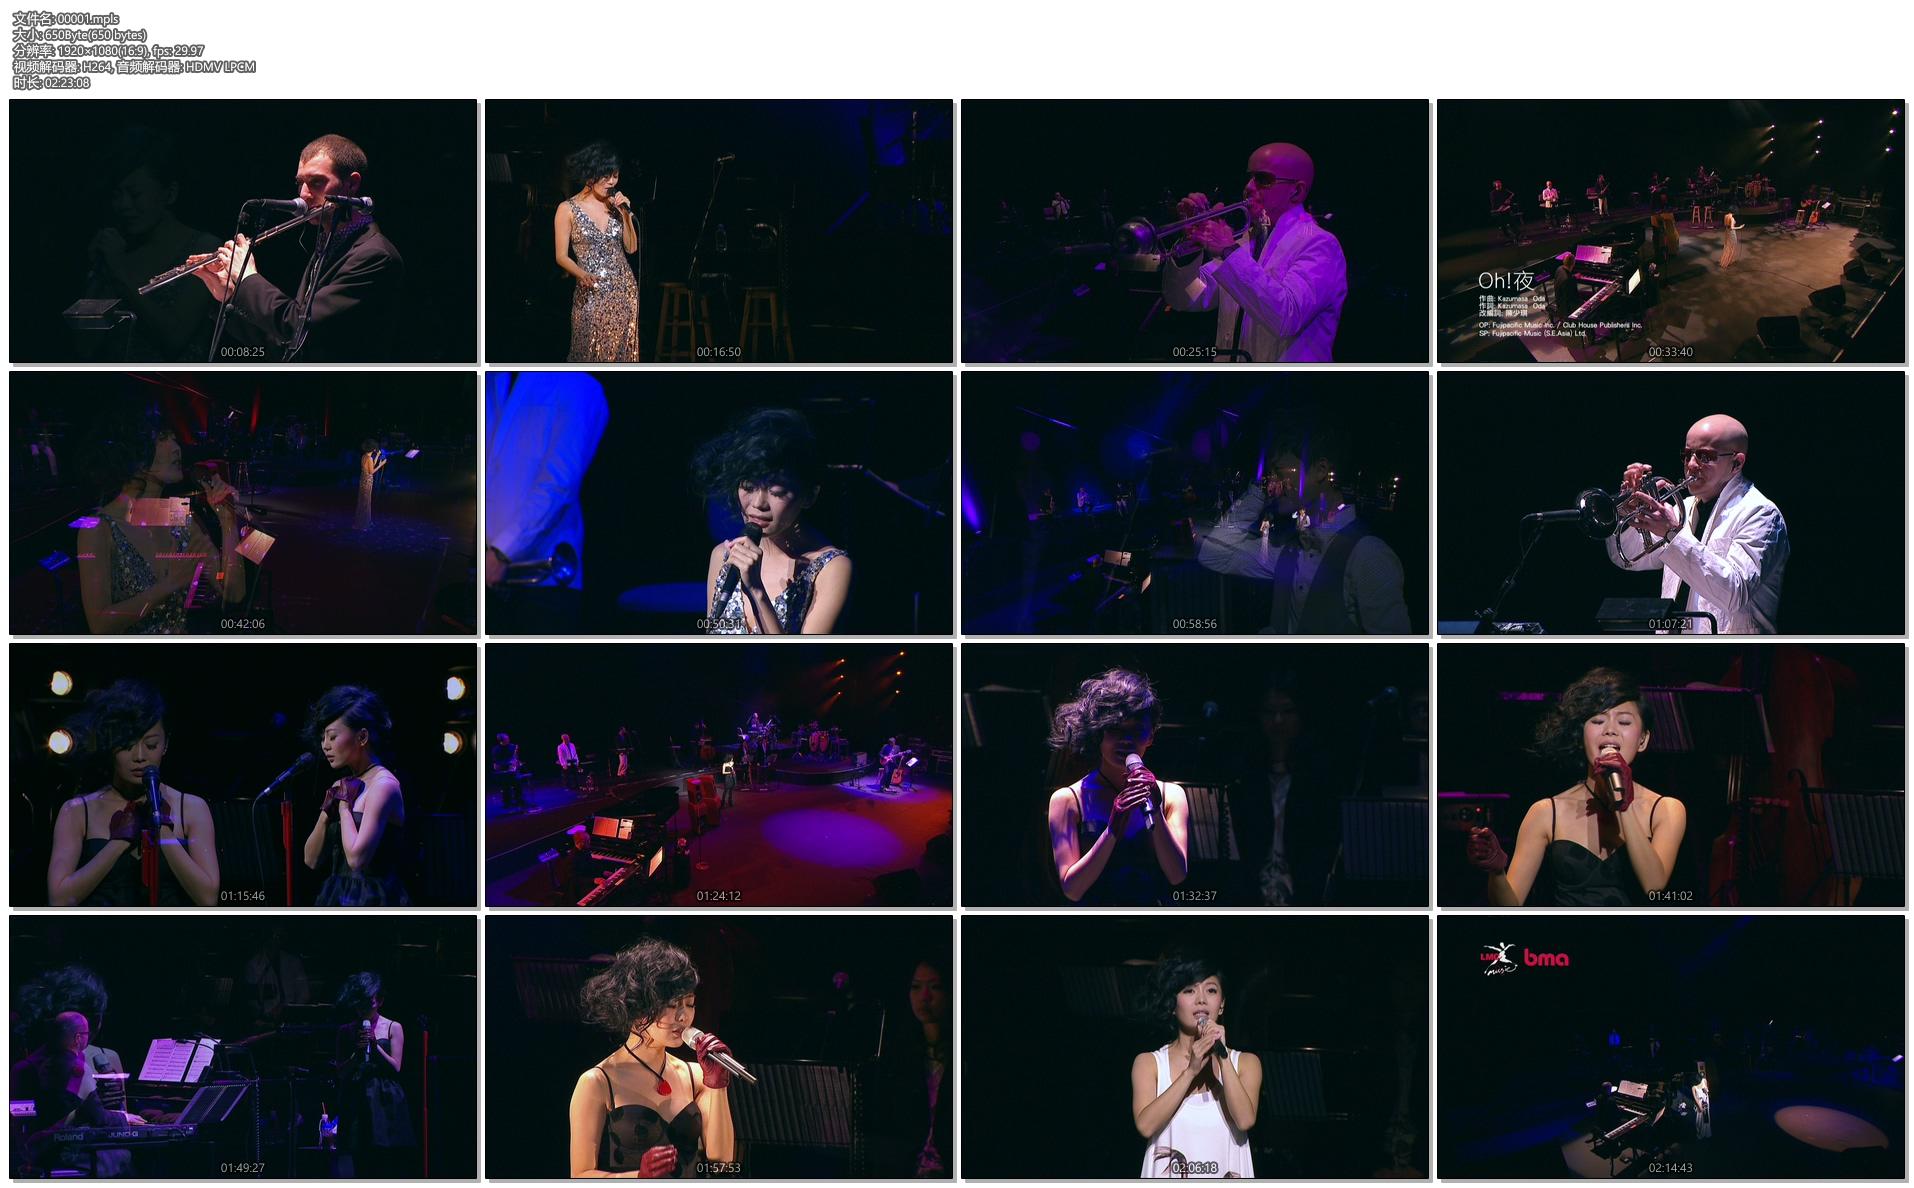 [蓝光原盘] 胡琳Bianca Live演唱会Bianca Wu Bianca Live 2011 HK《ISO 44.49G》插图(1)